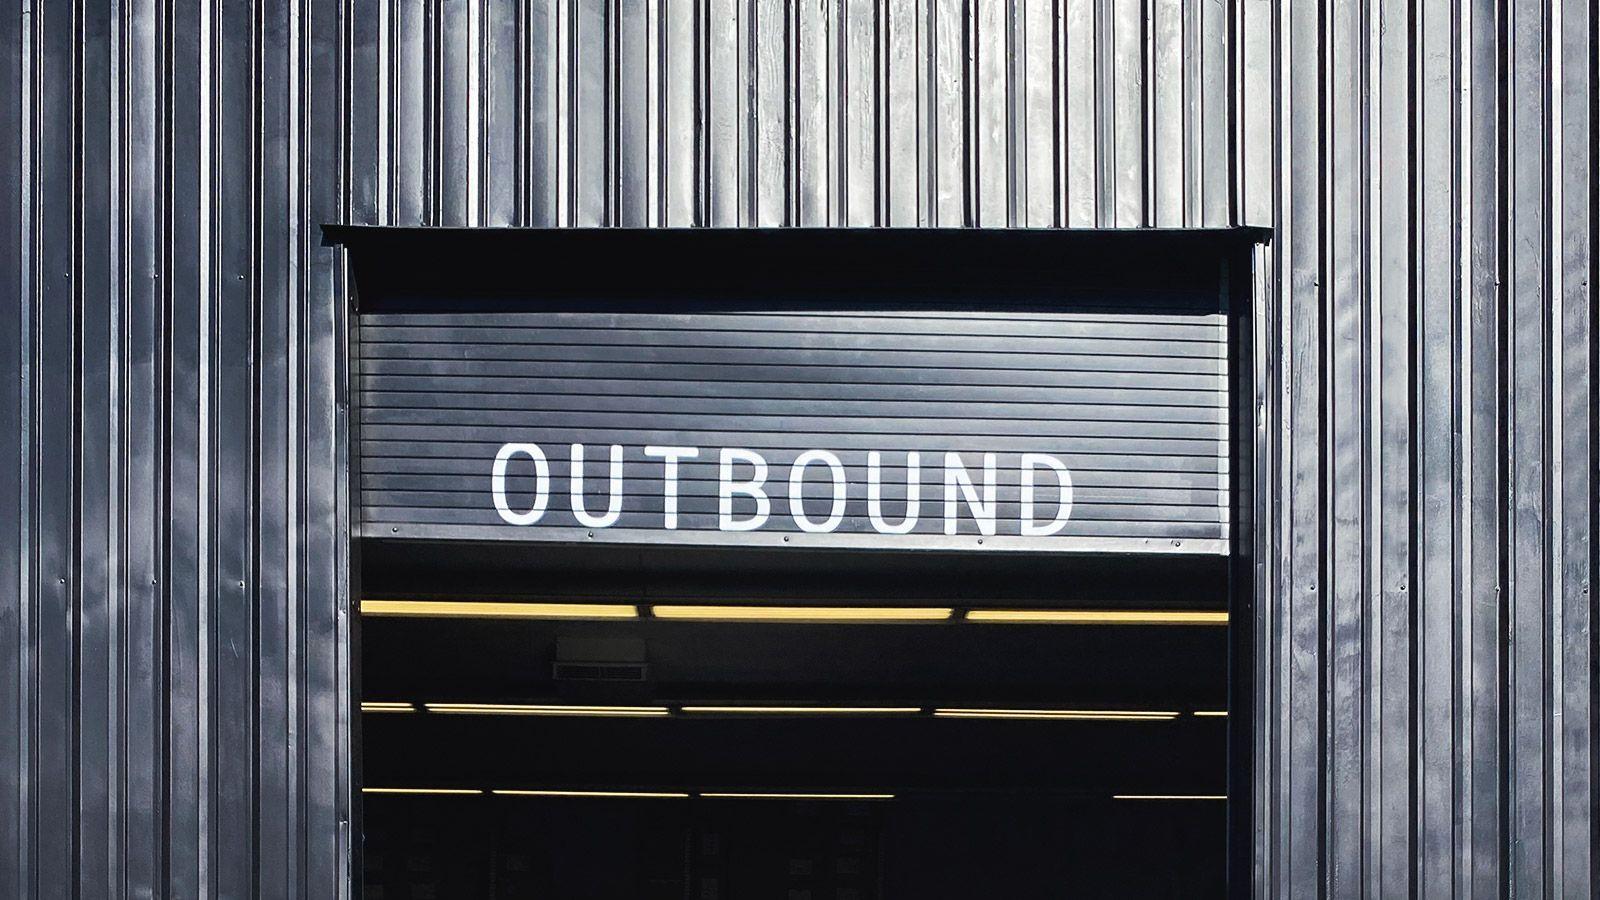 Outbound vinyl lettering